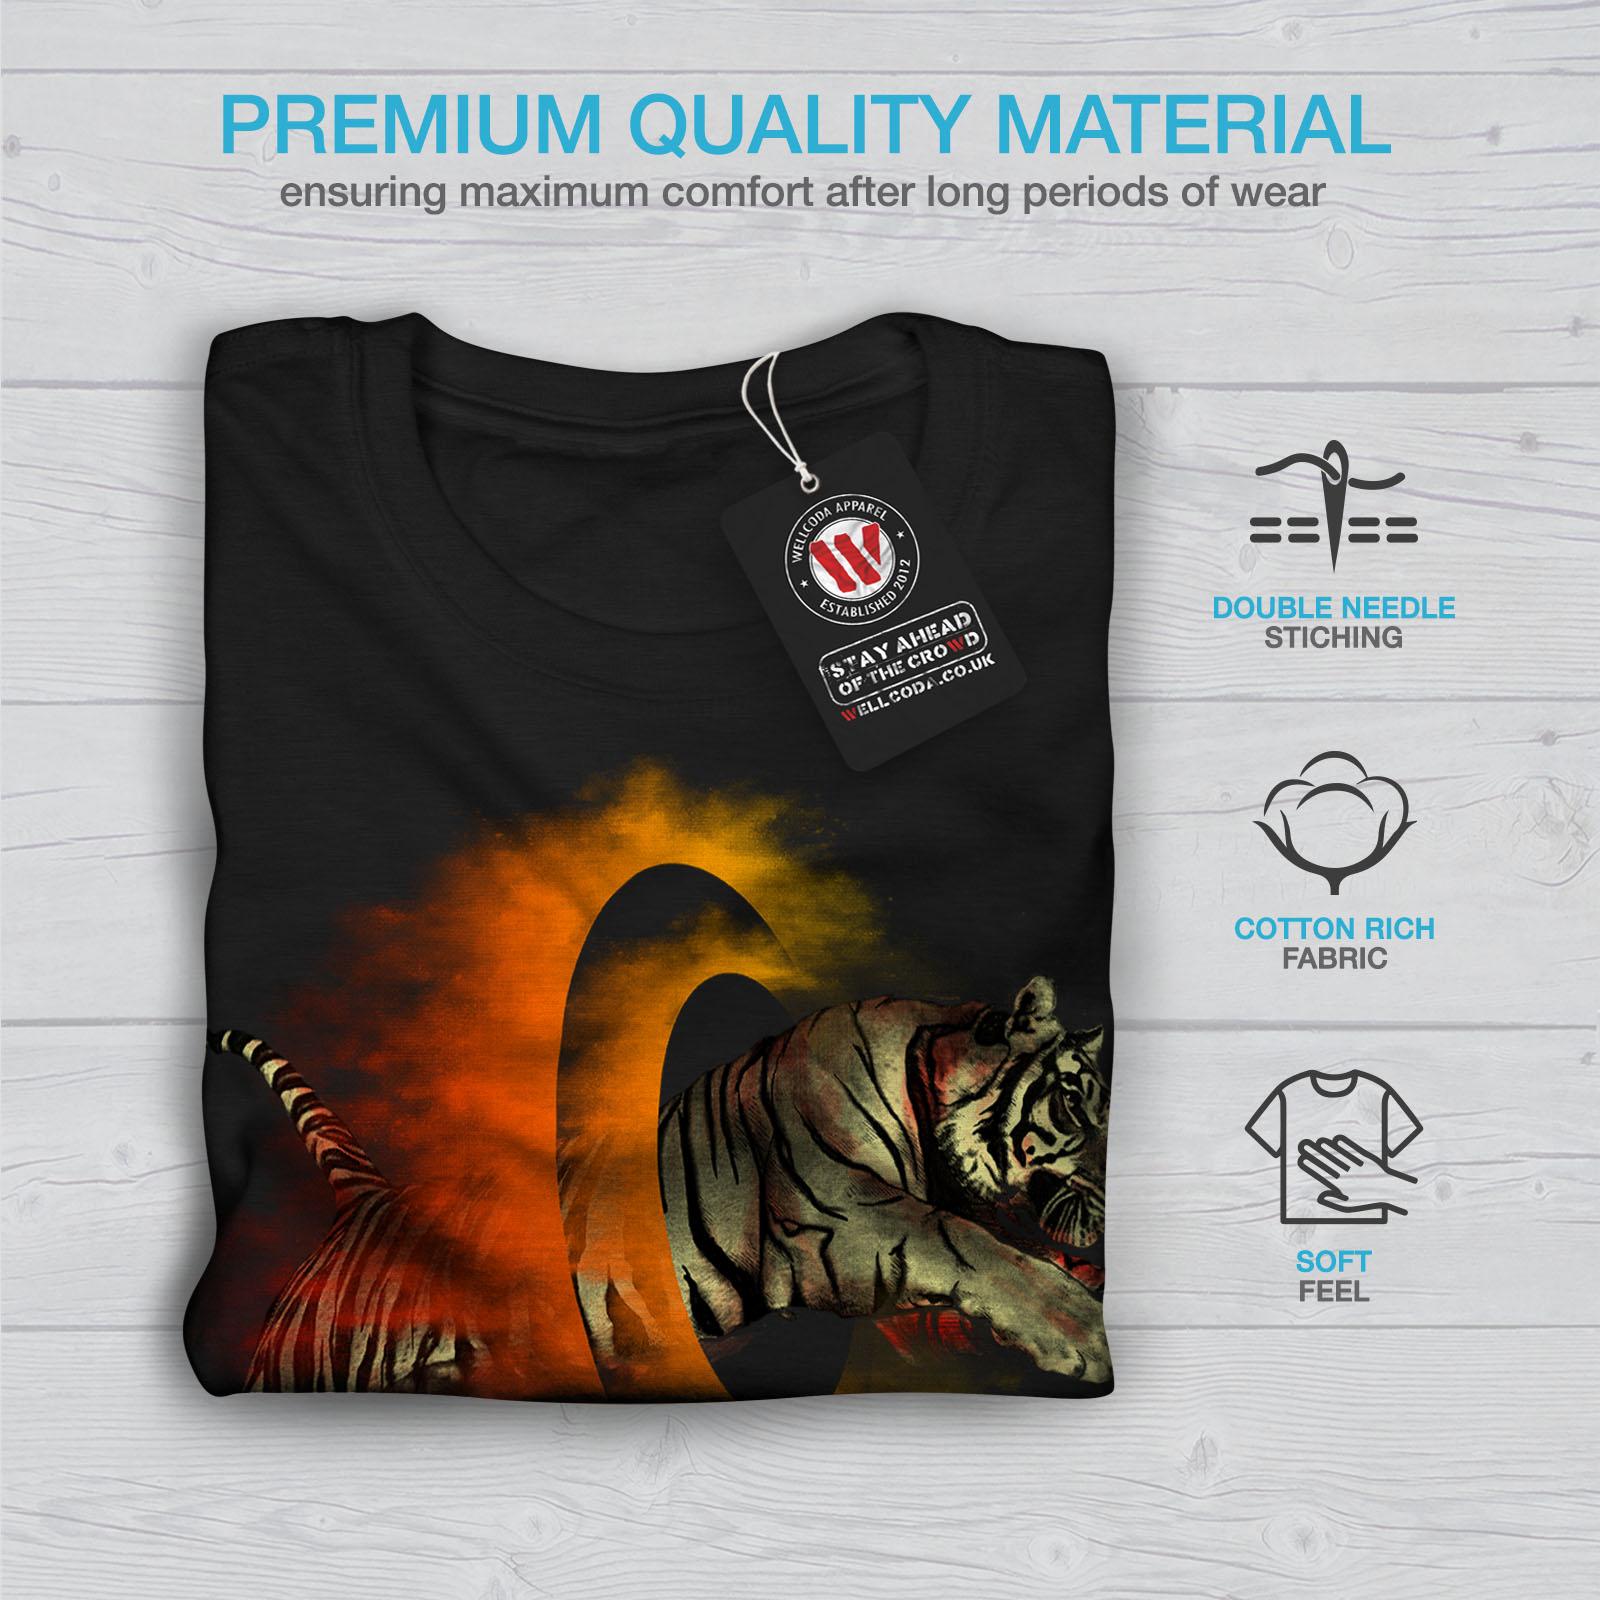 Wellcoda-Tiger-Portal-Cool-Mens-T-shirt-Flame-Graphic-Design-Printed-Tee thumbnail 7